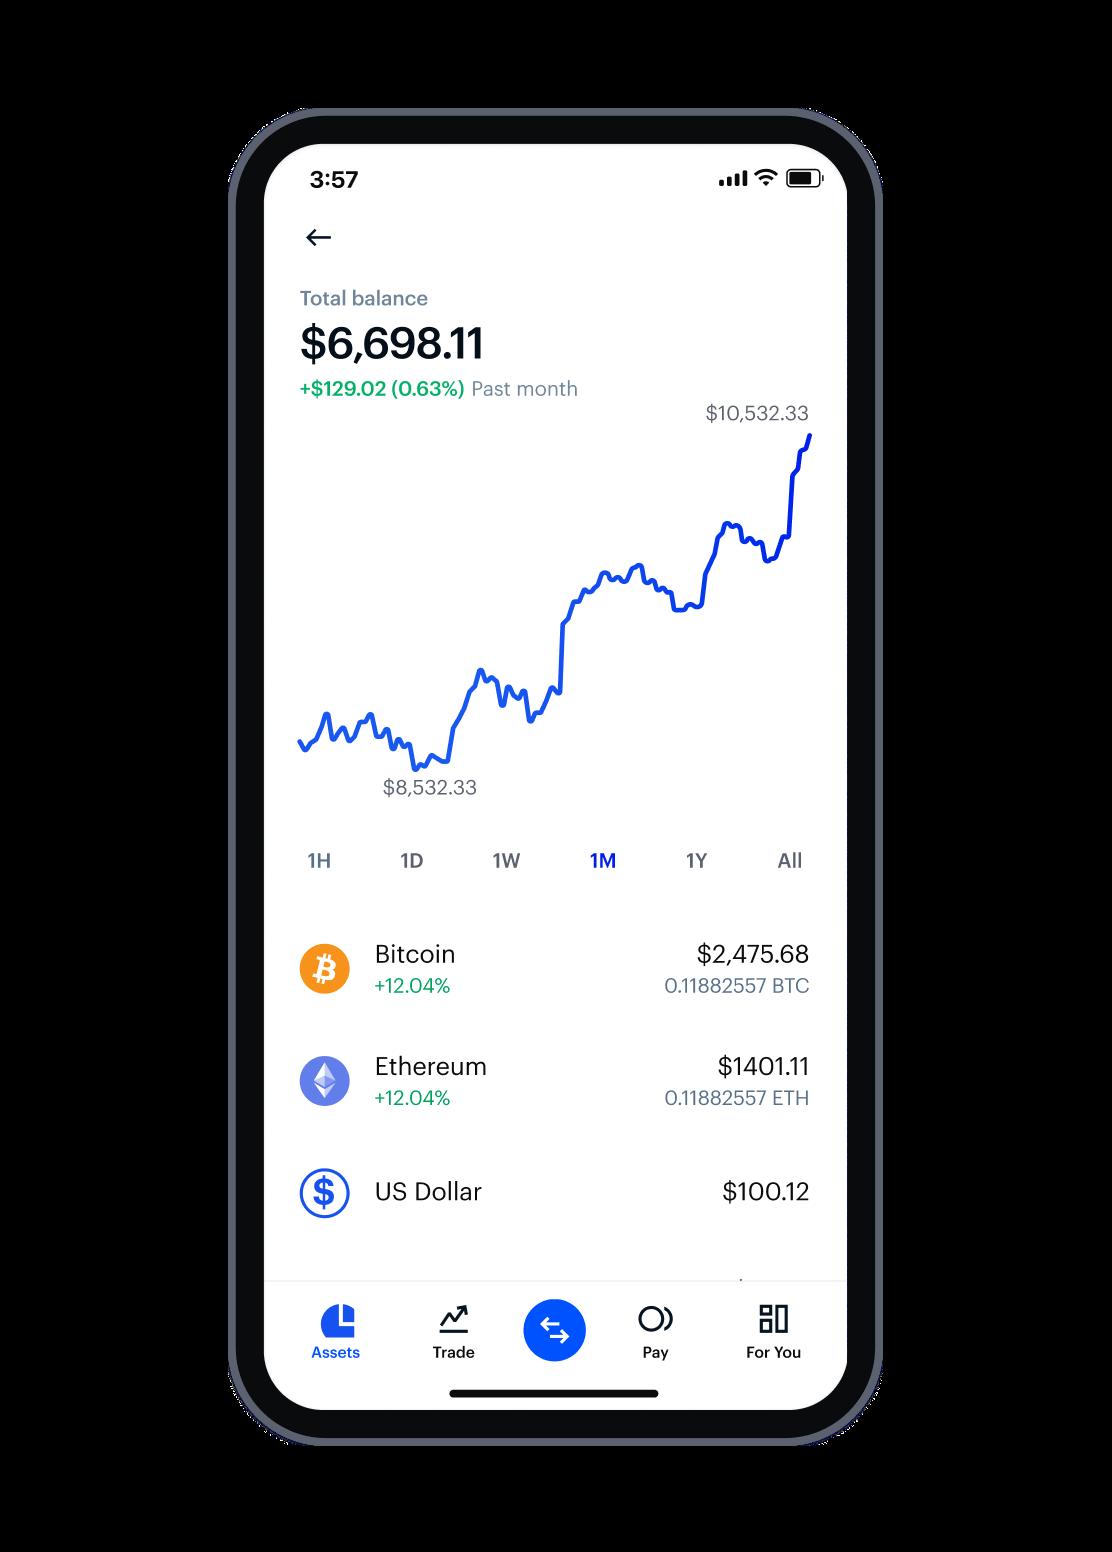 Asset - mobile app